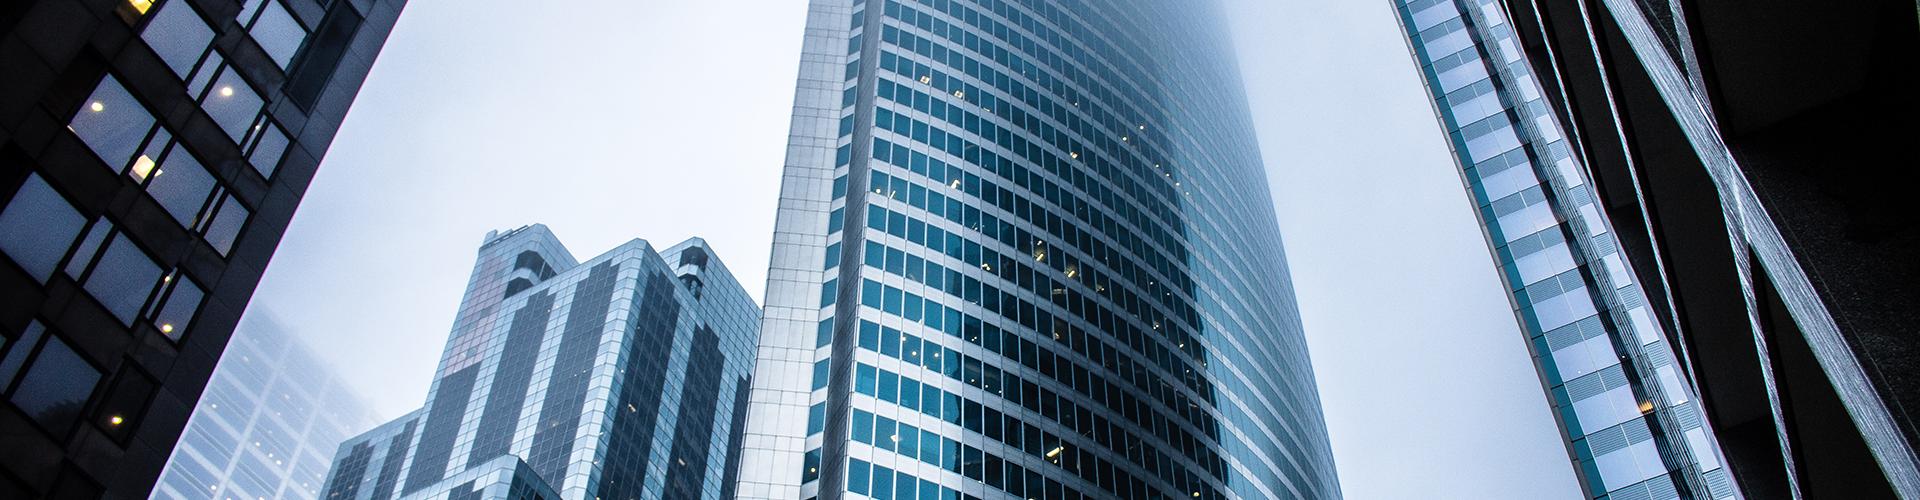 banner_skyscraper